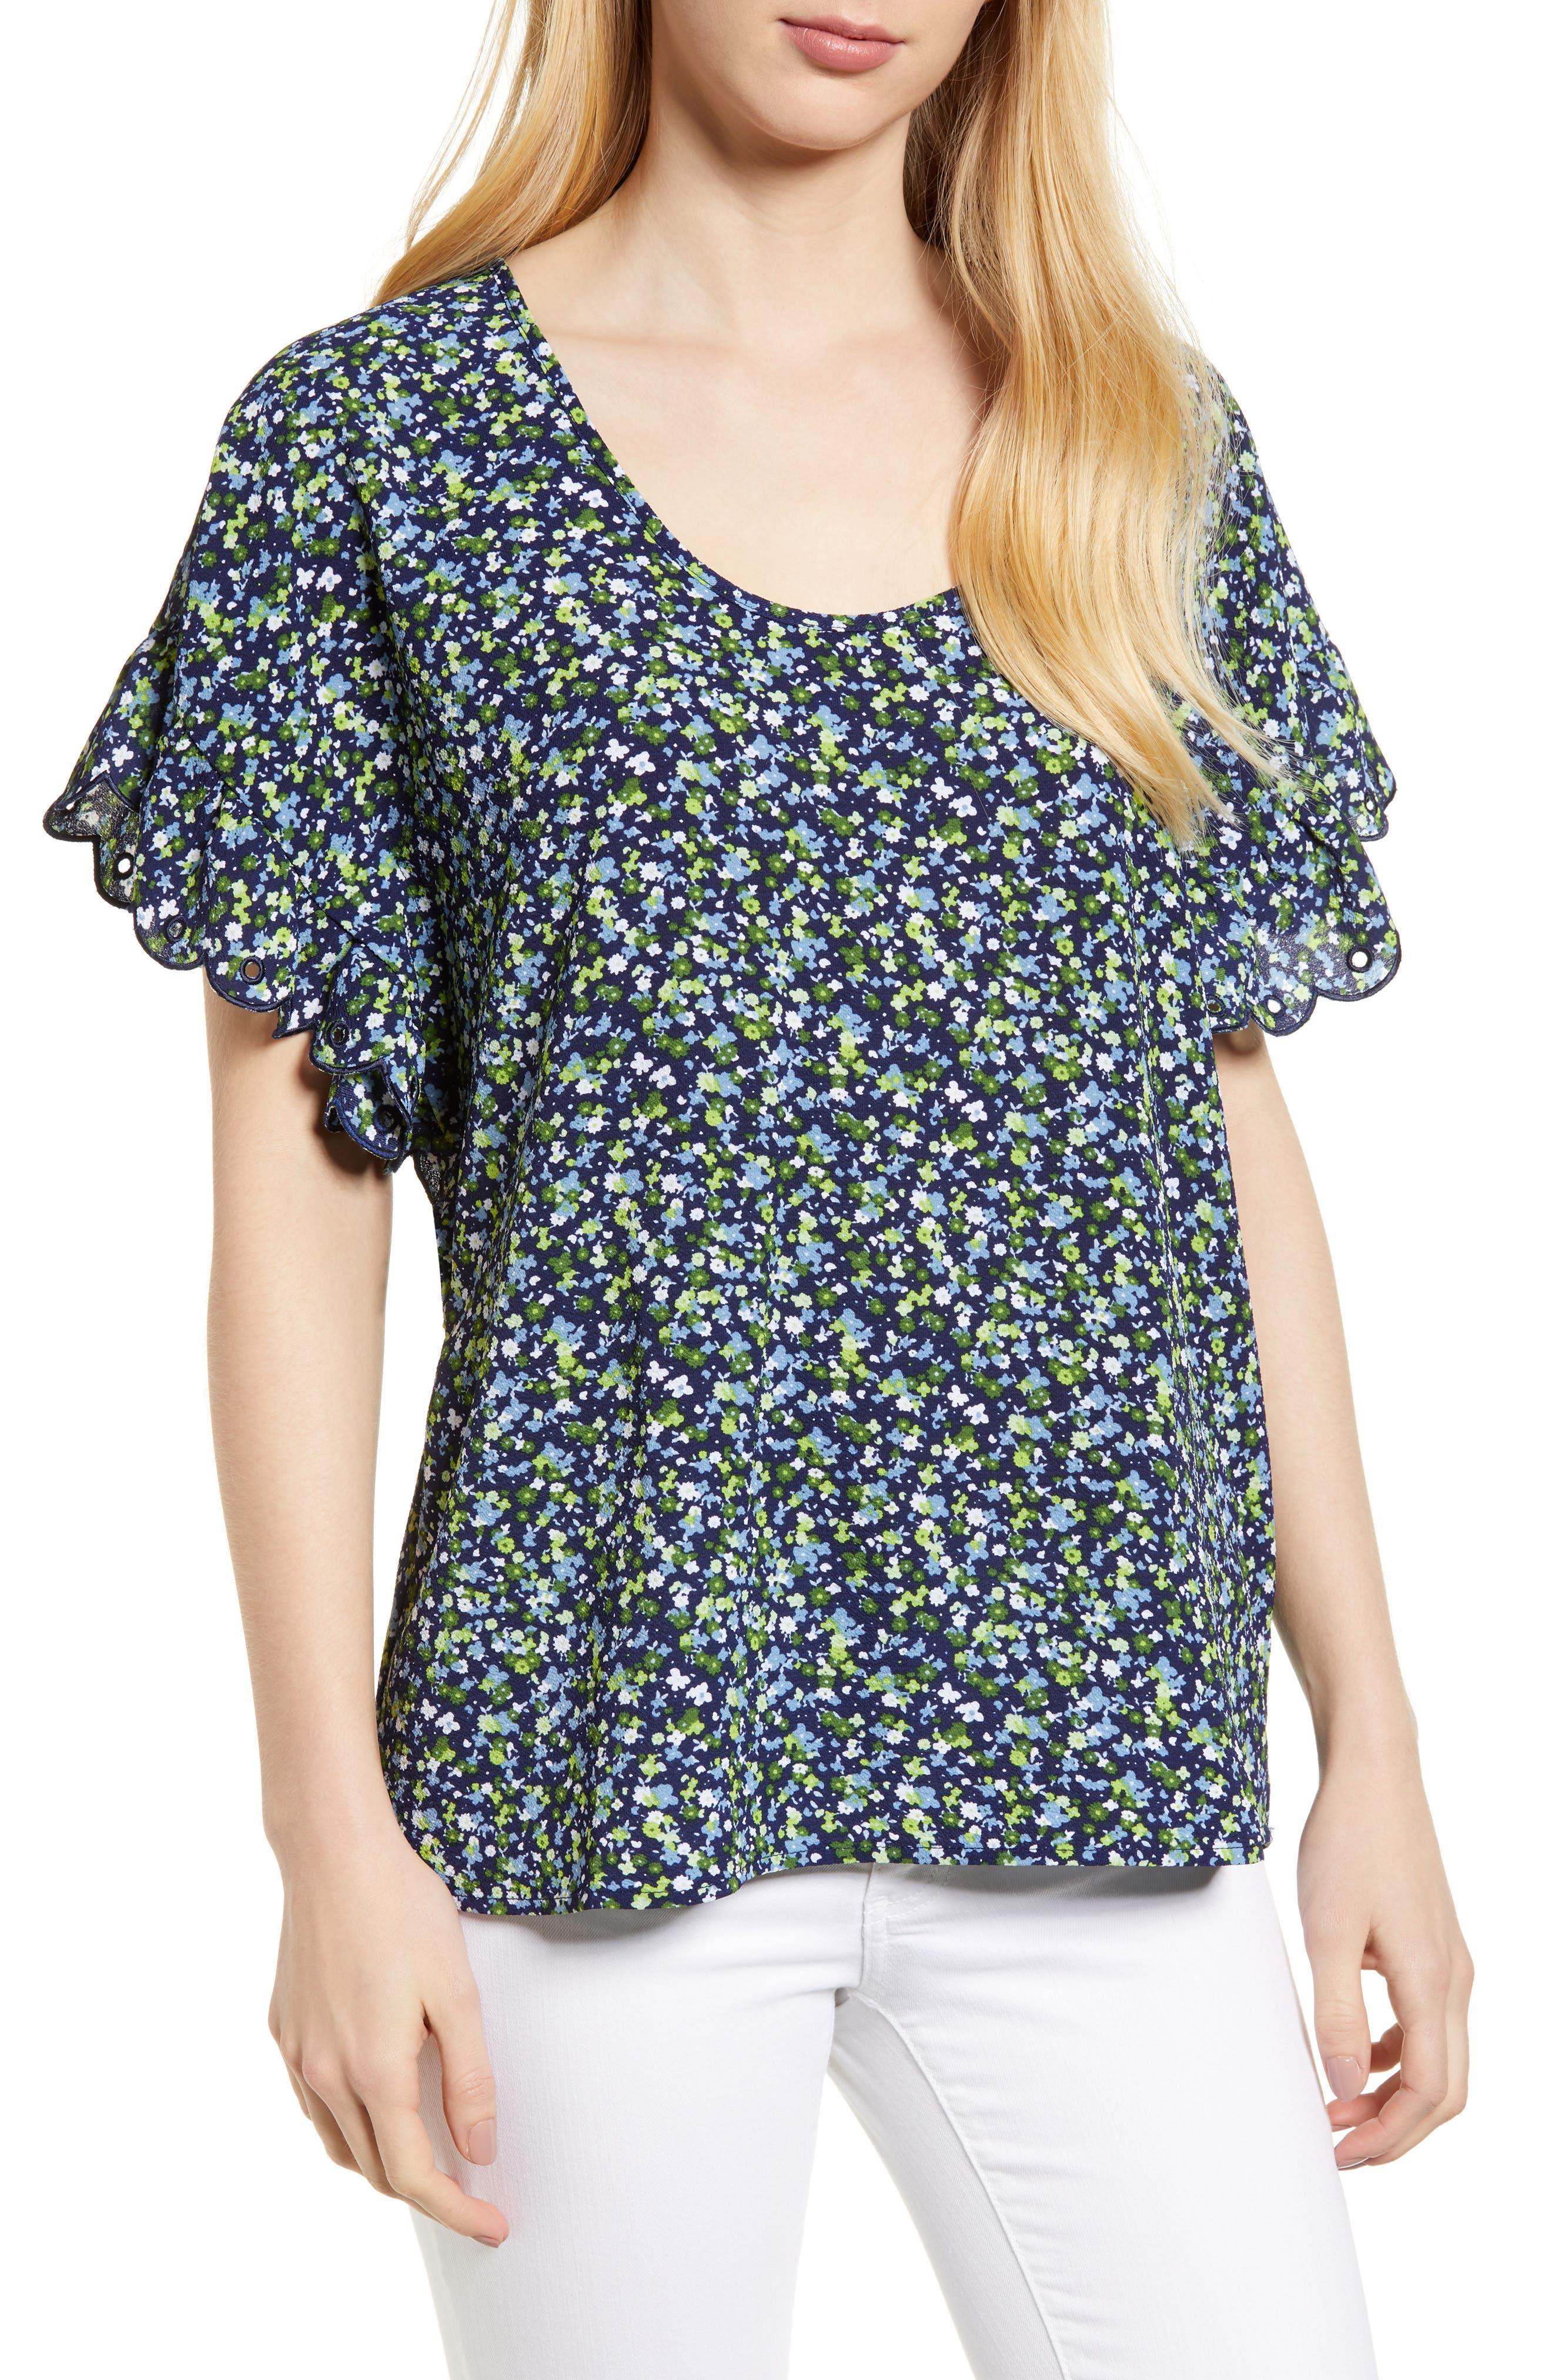 Wildflower Print Top,                         Main,                         color, True Navy/ Green Apple Mu